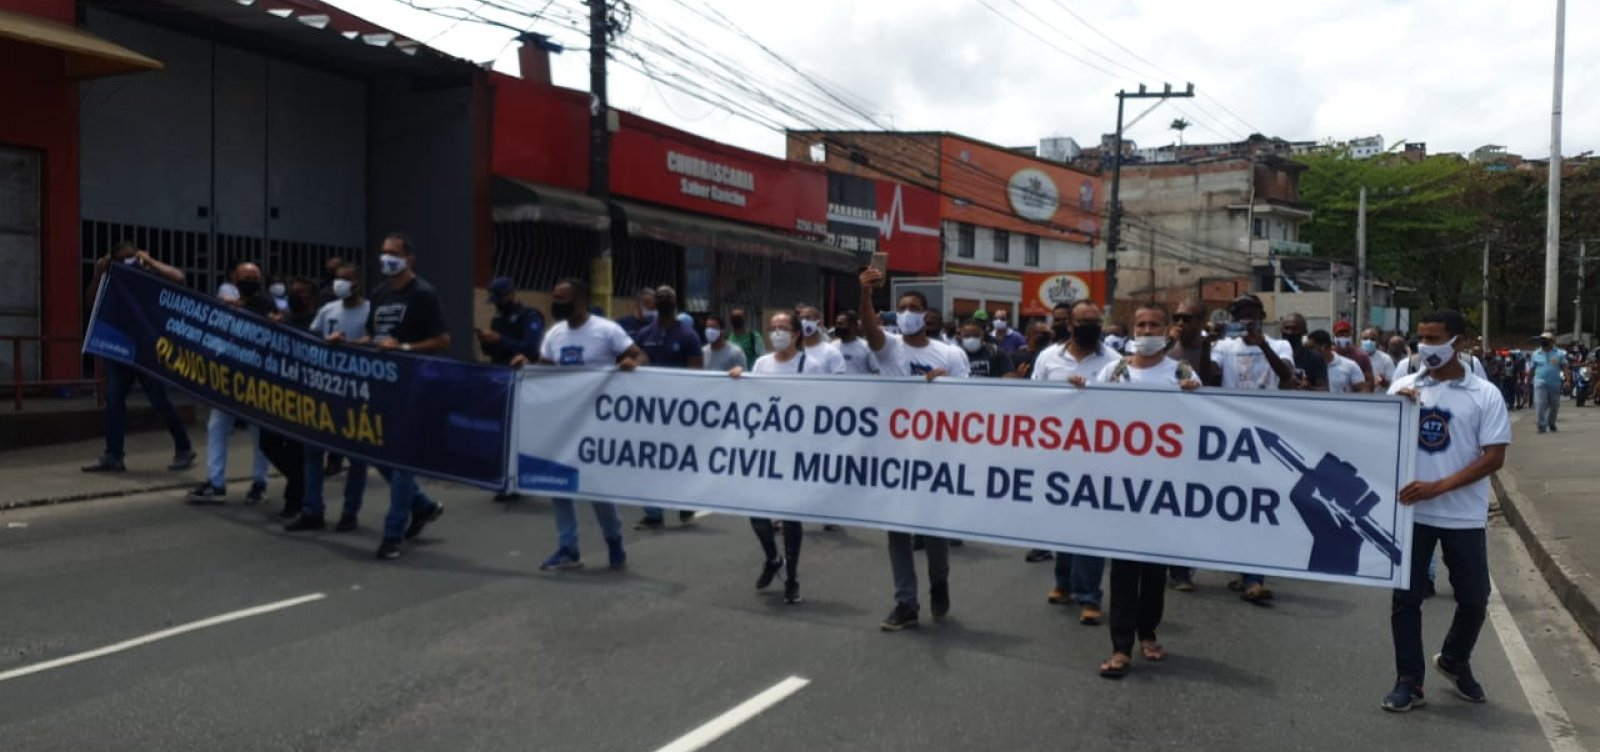 Agentes da Guarda Civil Municipal fazem protesto na Avenida San Martin